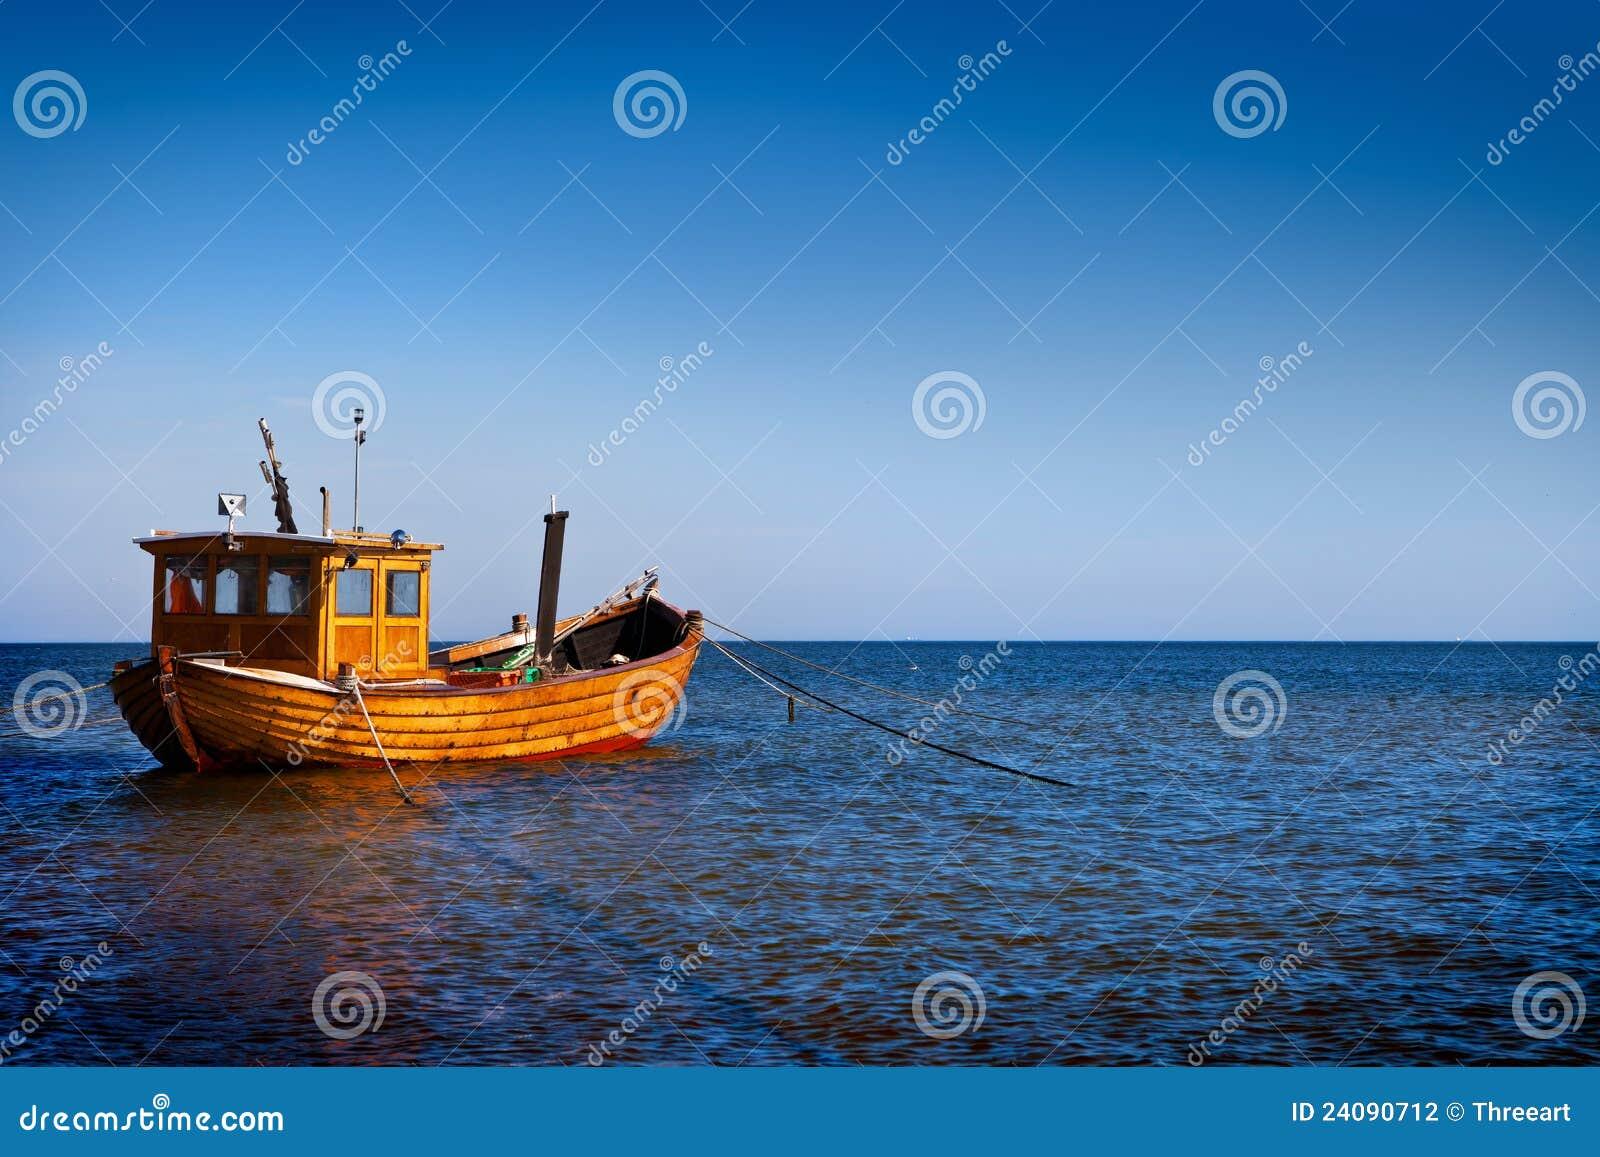 Fishing boat royalty free stock photo for Free fishing boats